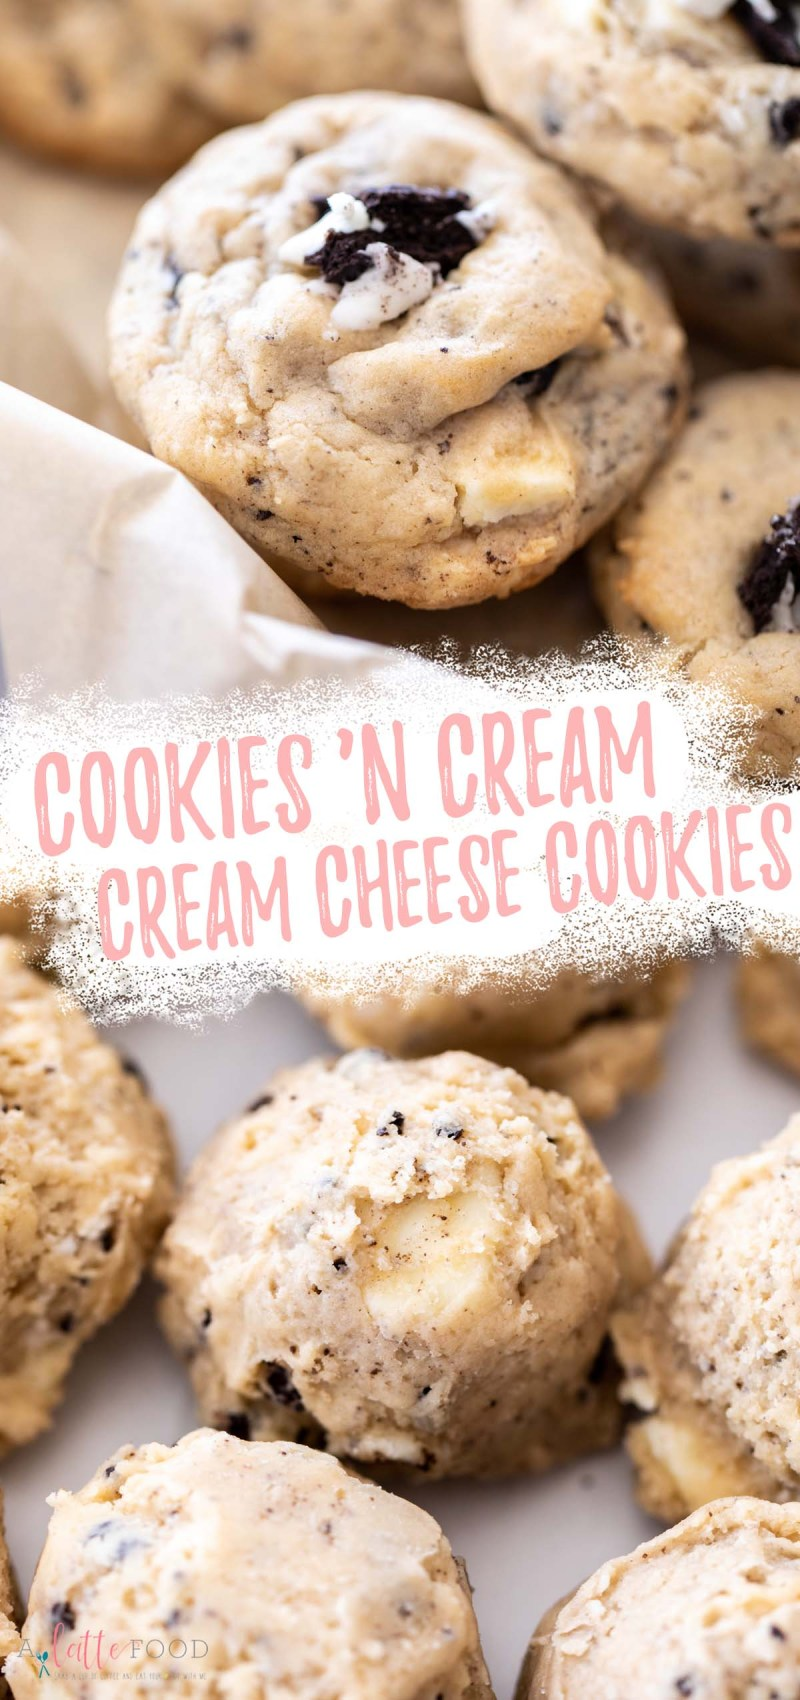 Cookies & Cream Cream Cheese Cookies collage